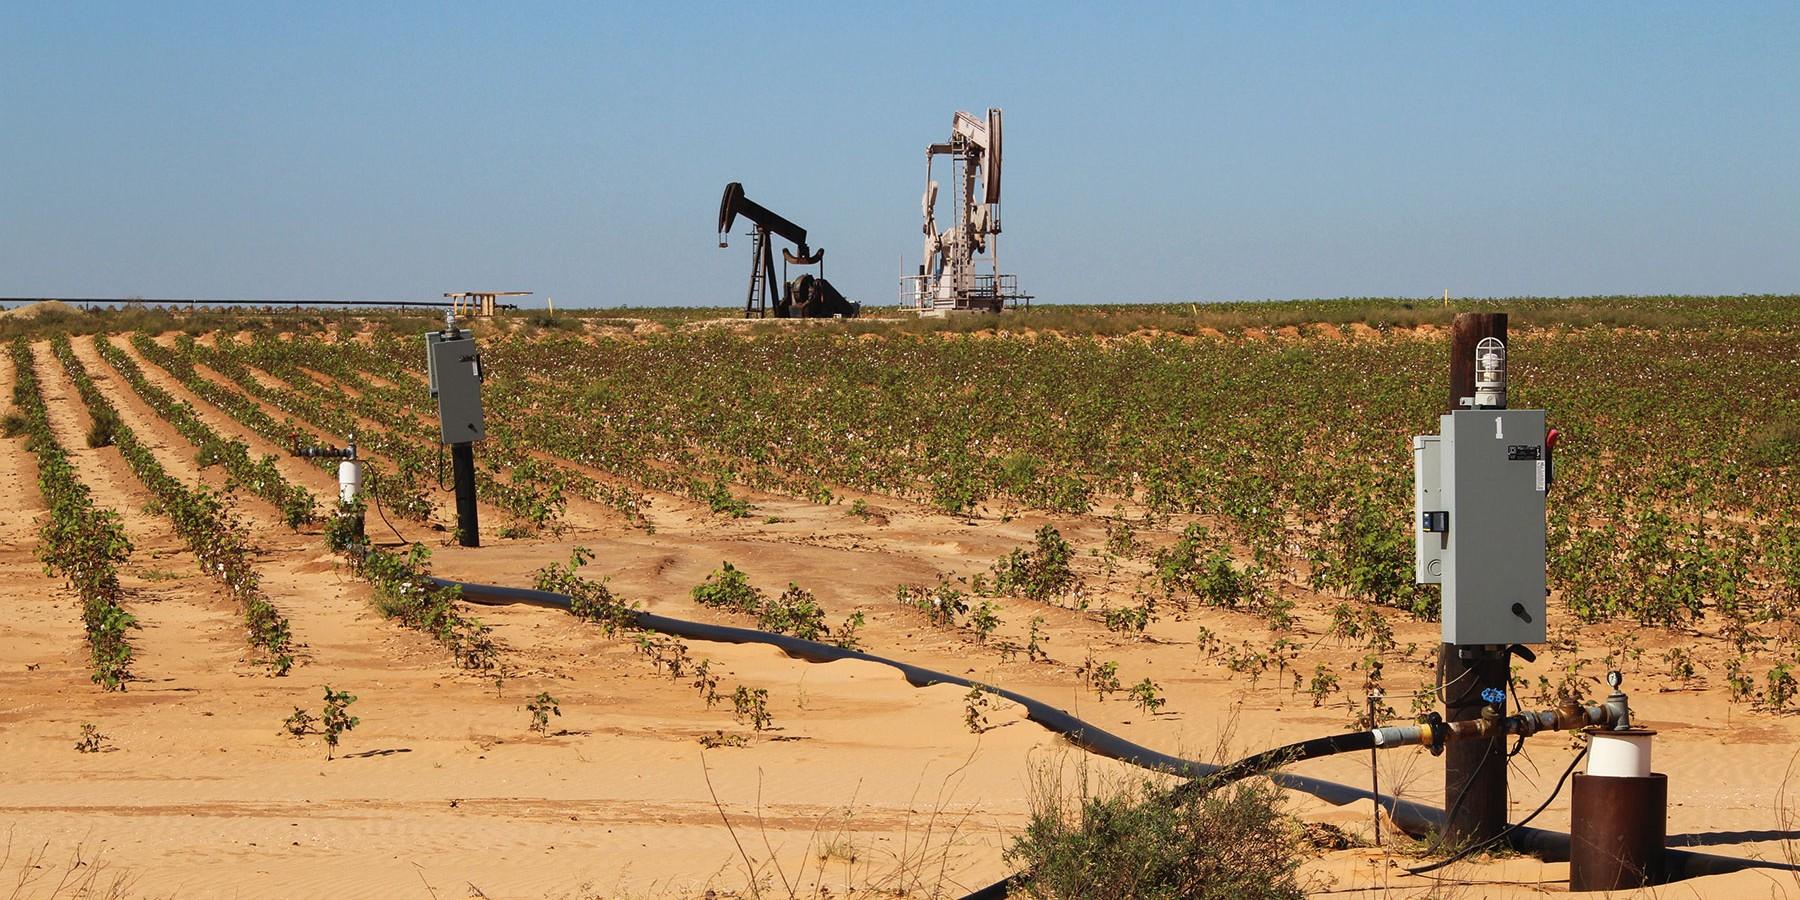 EGEB: Permian Basin has 'highest emissions ever measured'